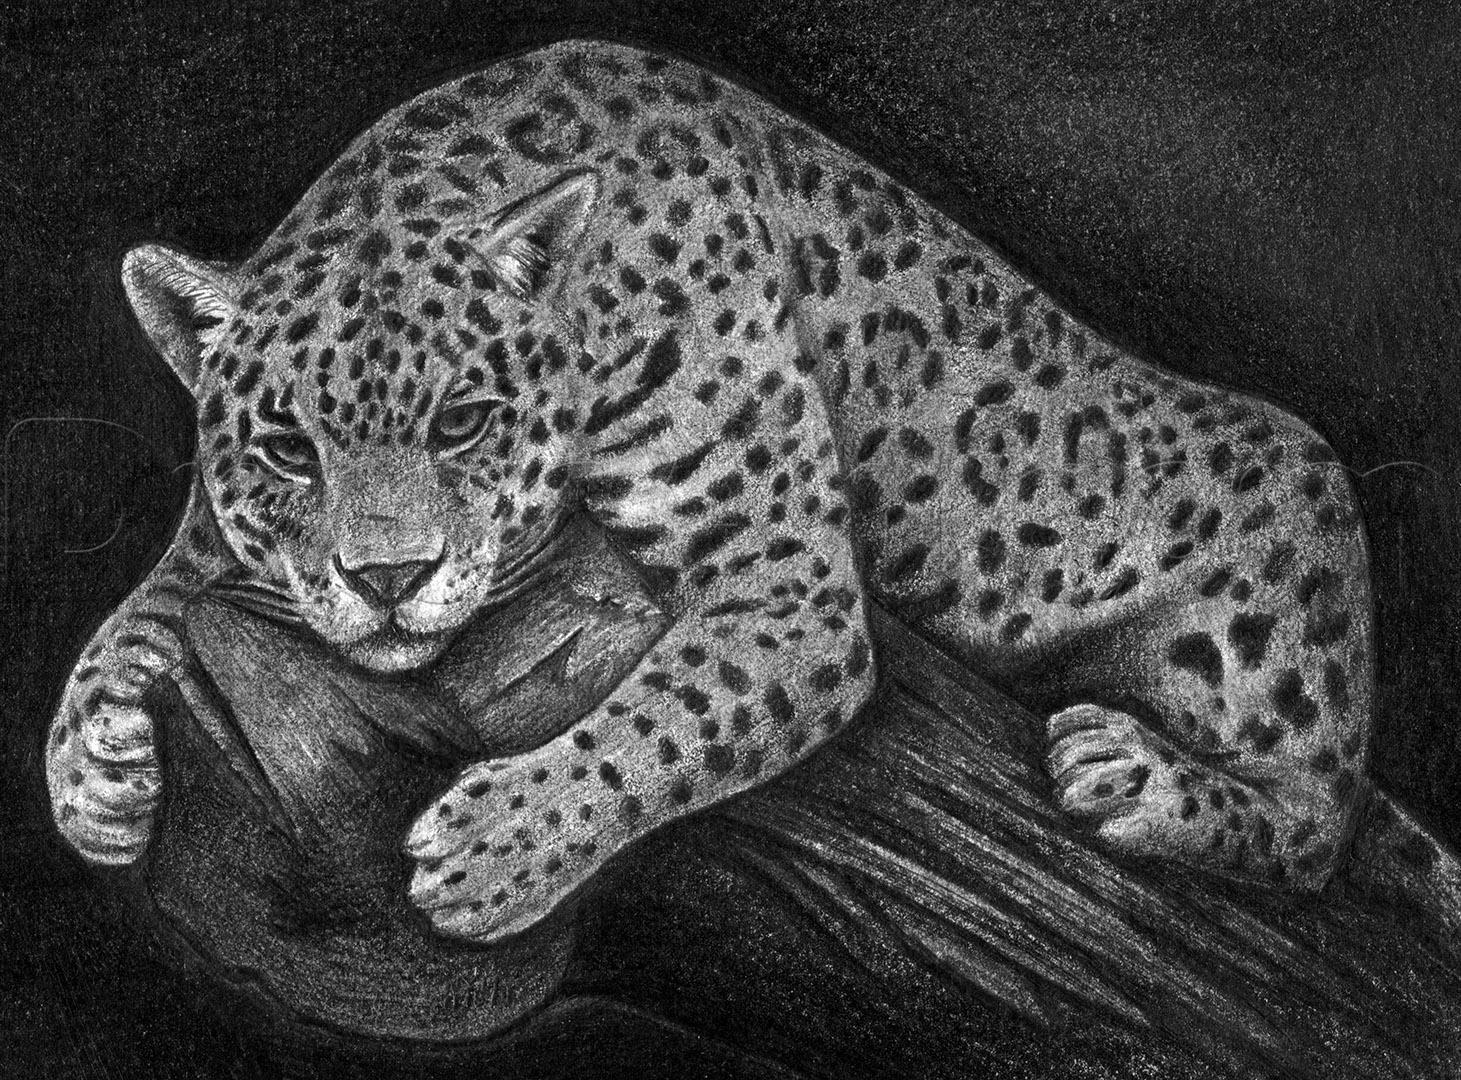 Drawn jaguar #6